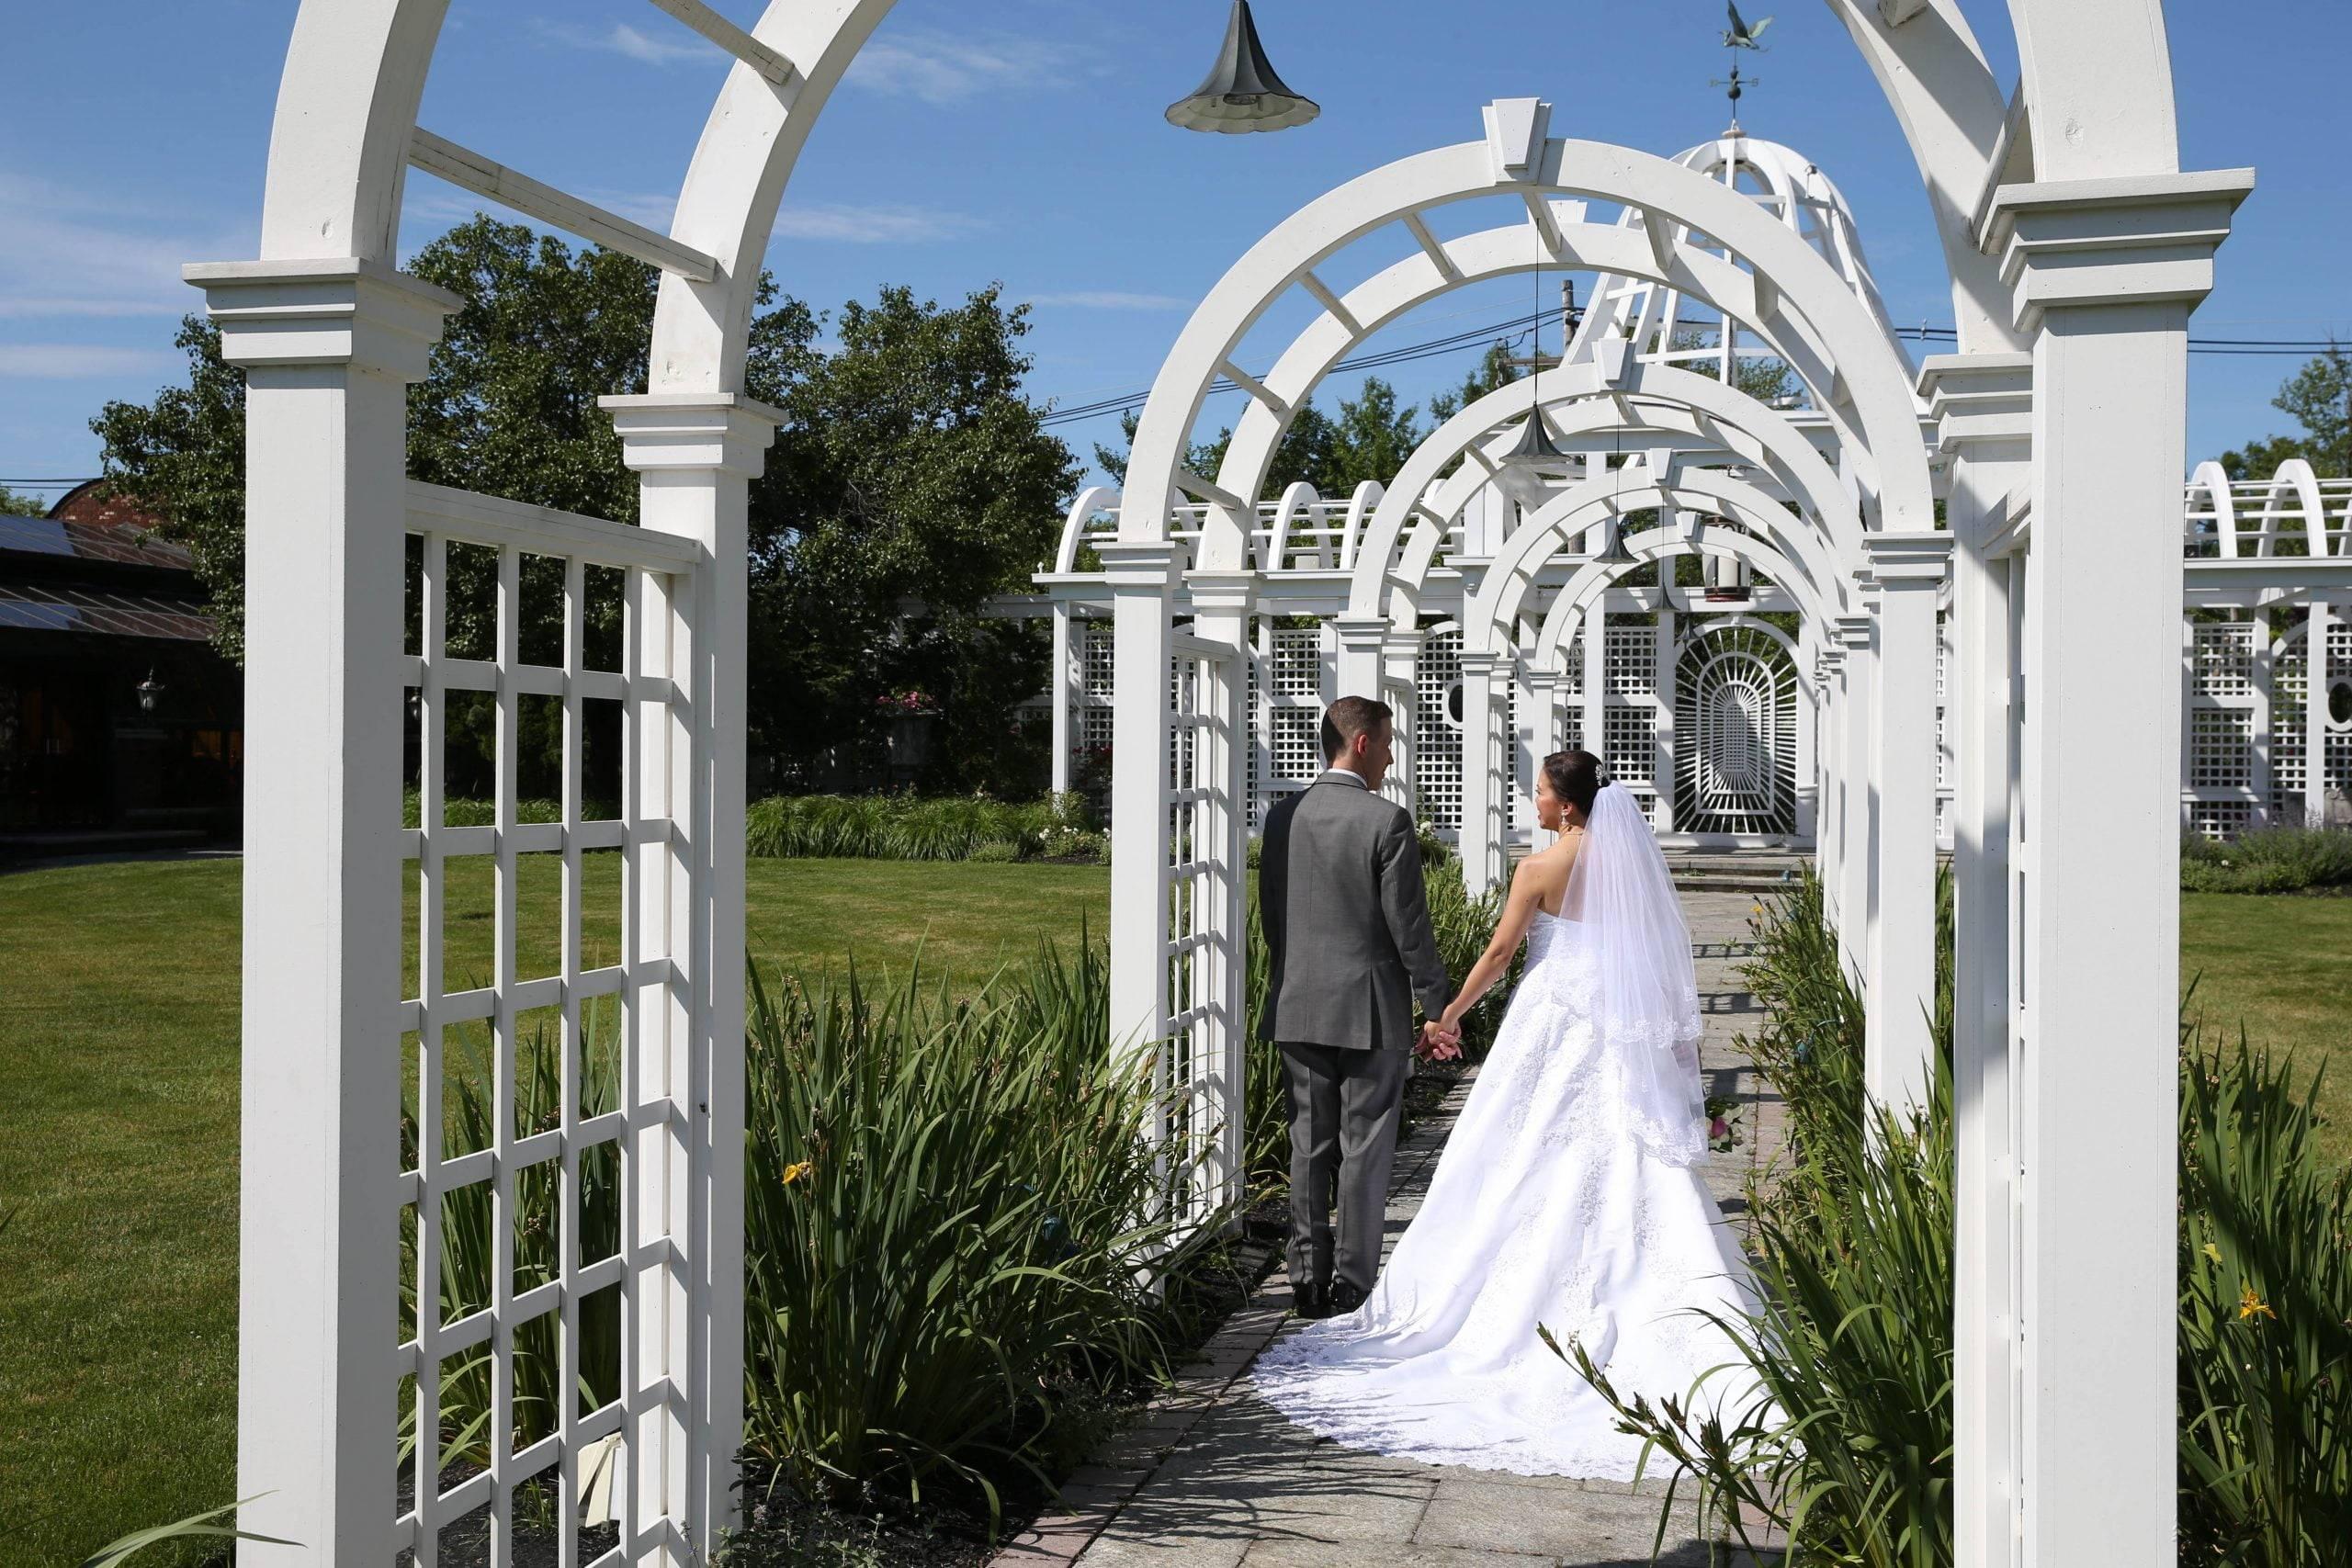 Birchwood Manor bride and groom in arbor